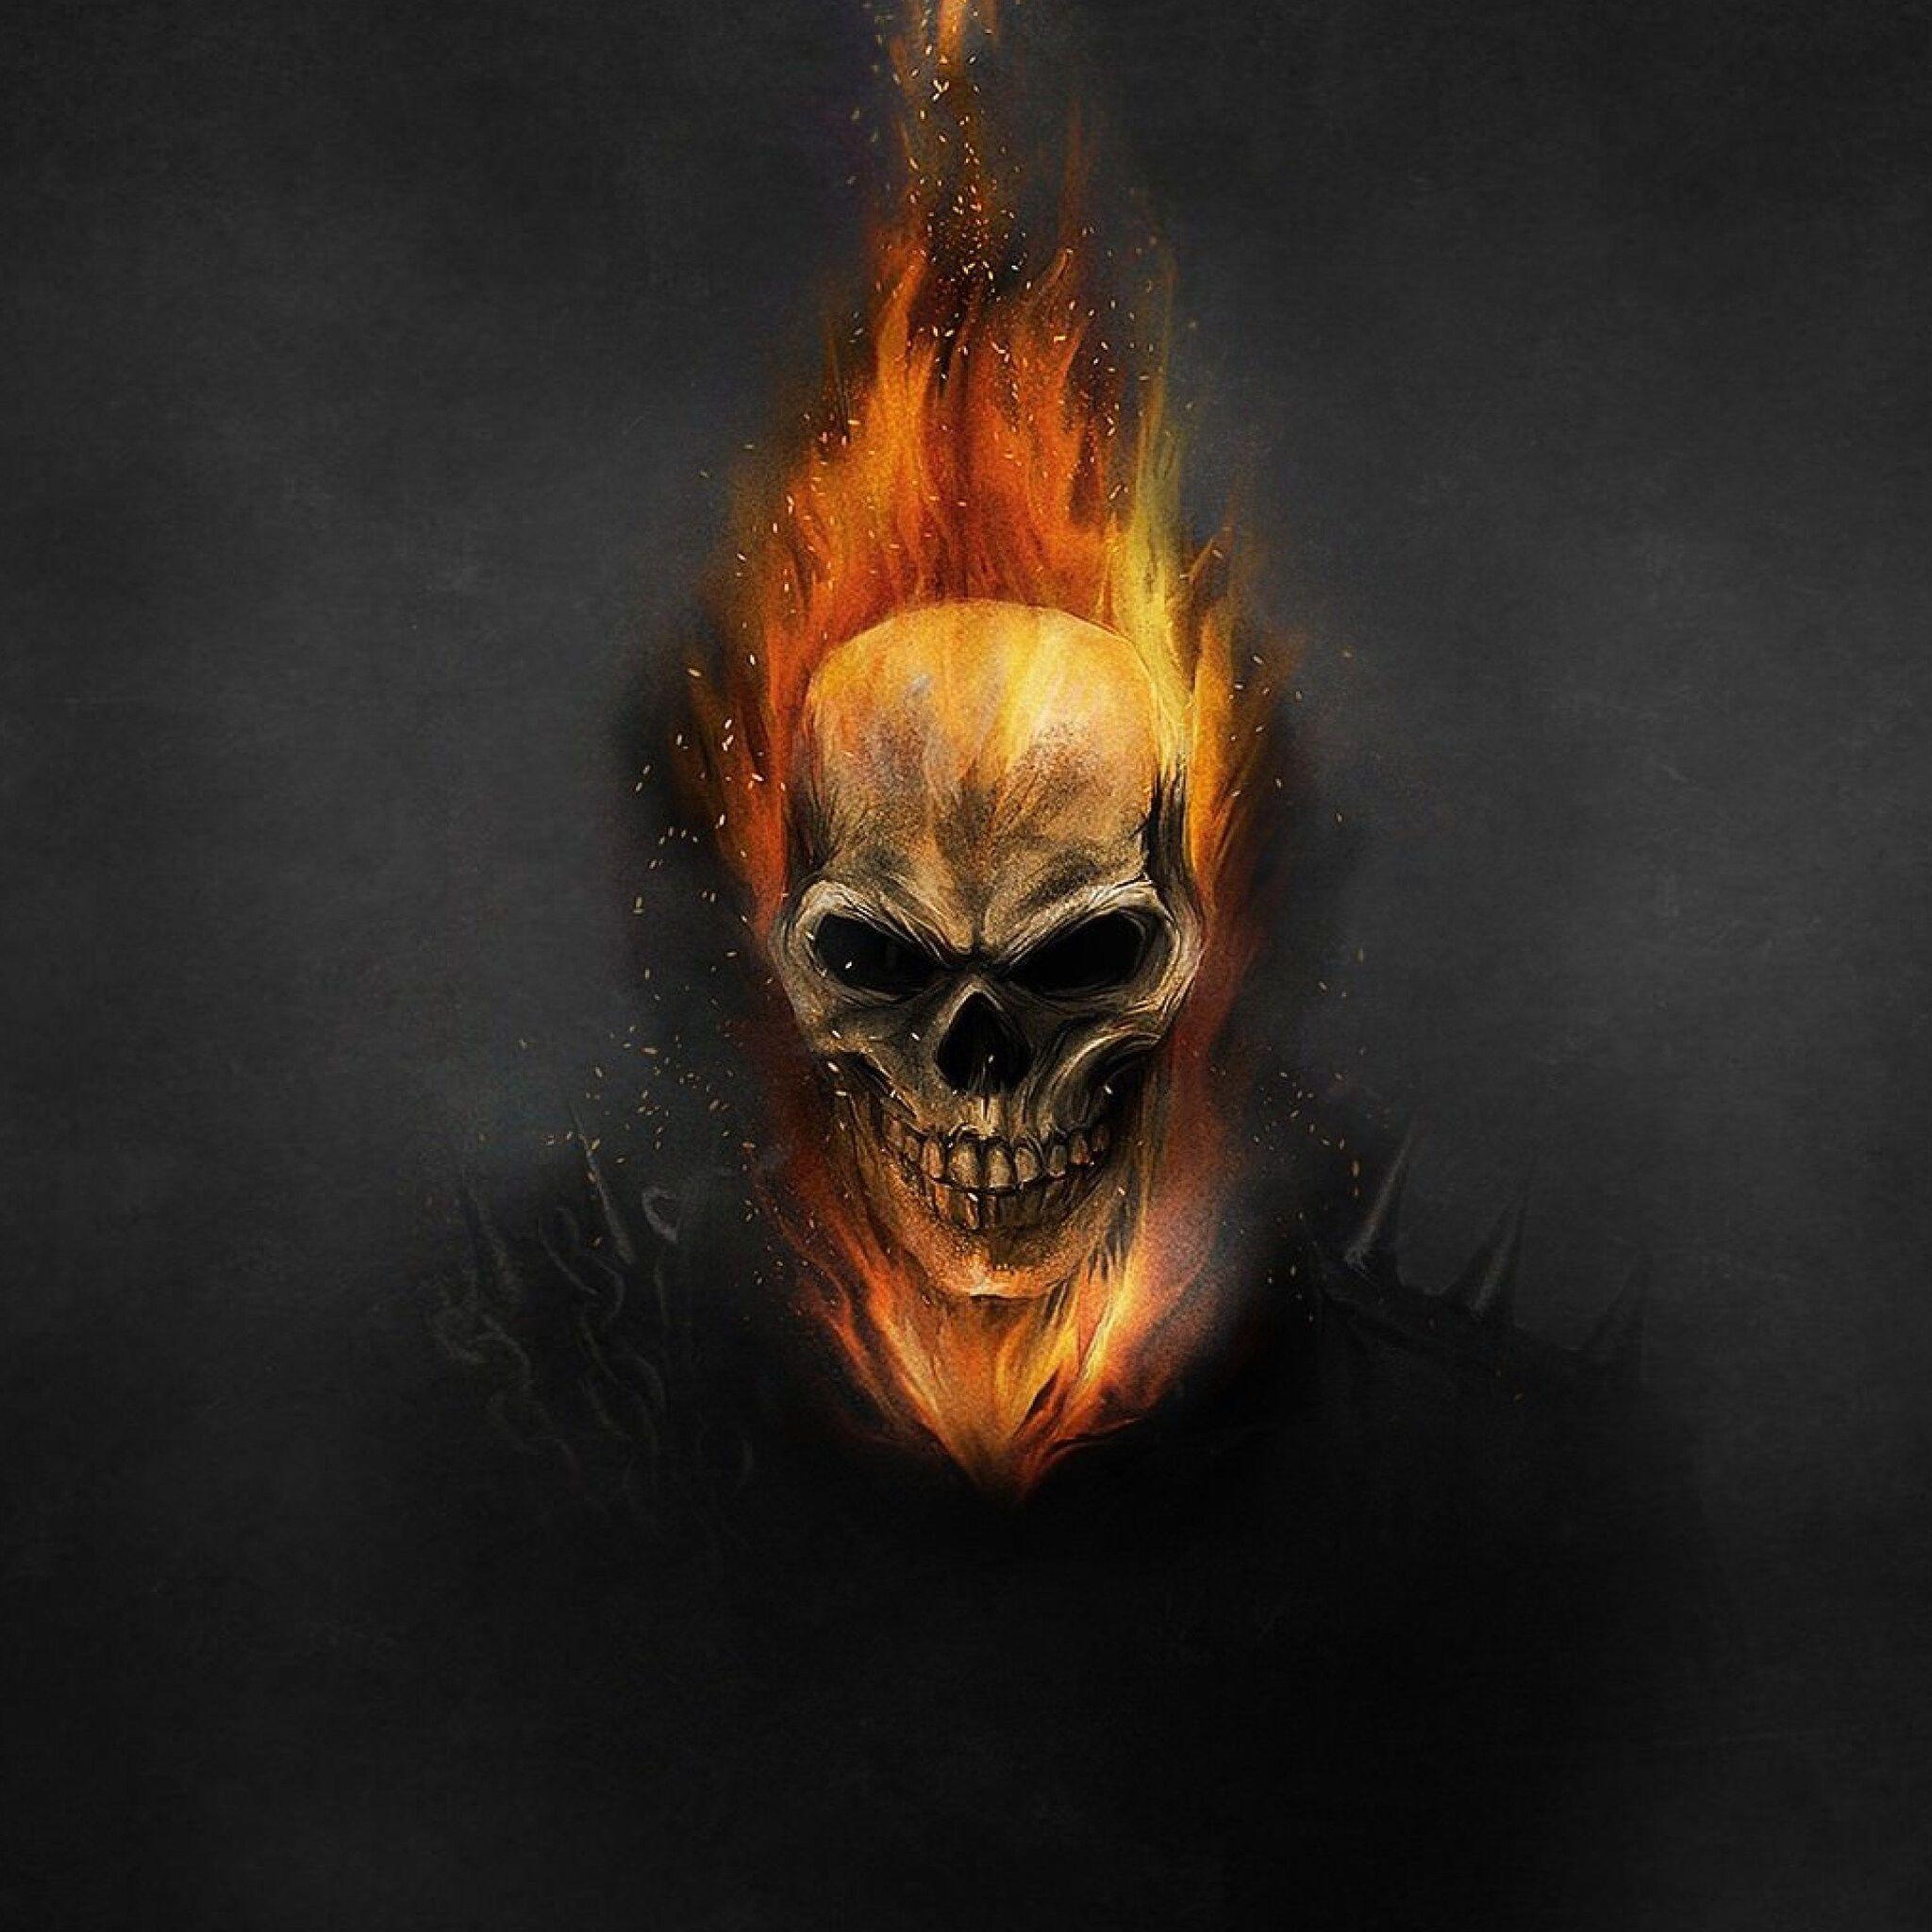 ghostrider-art-4k-23.jpg